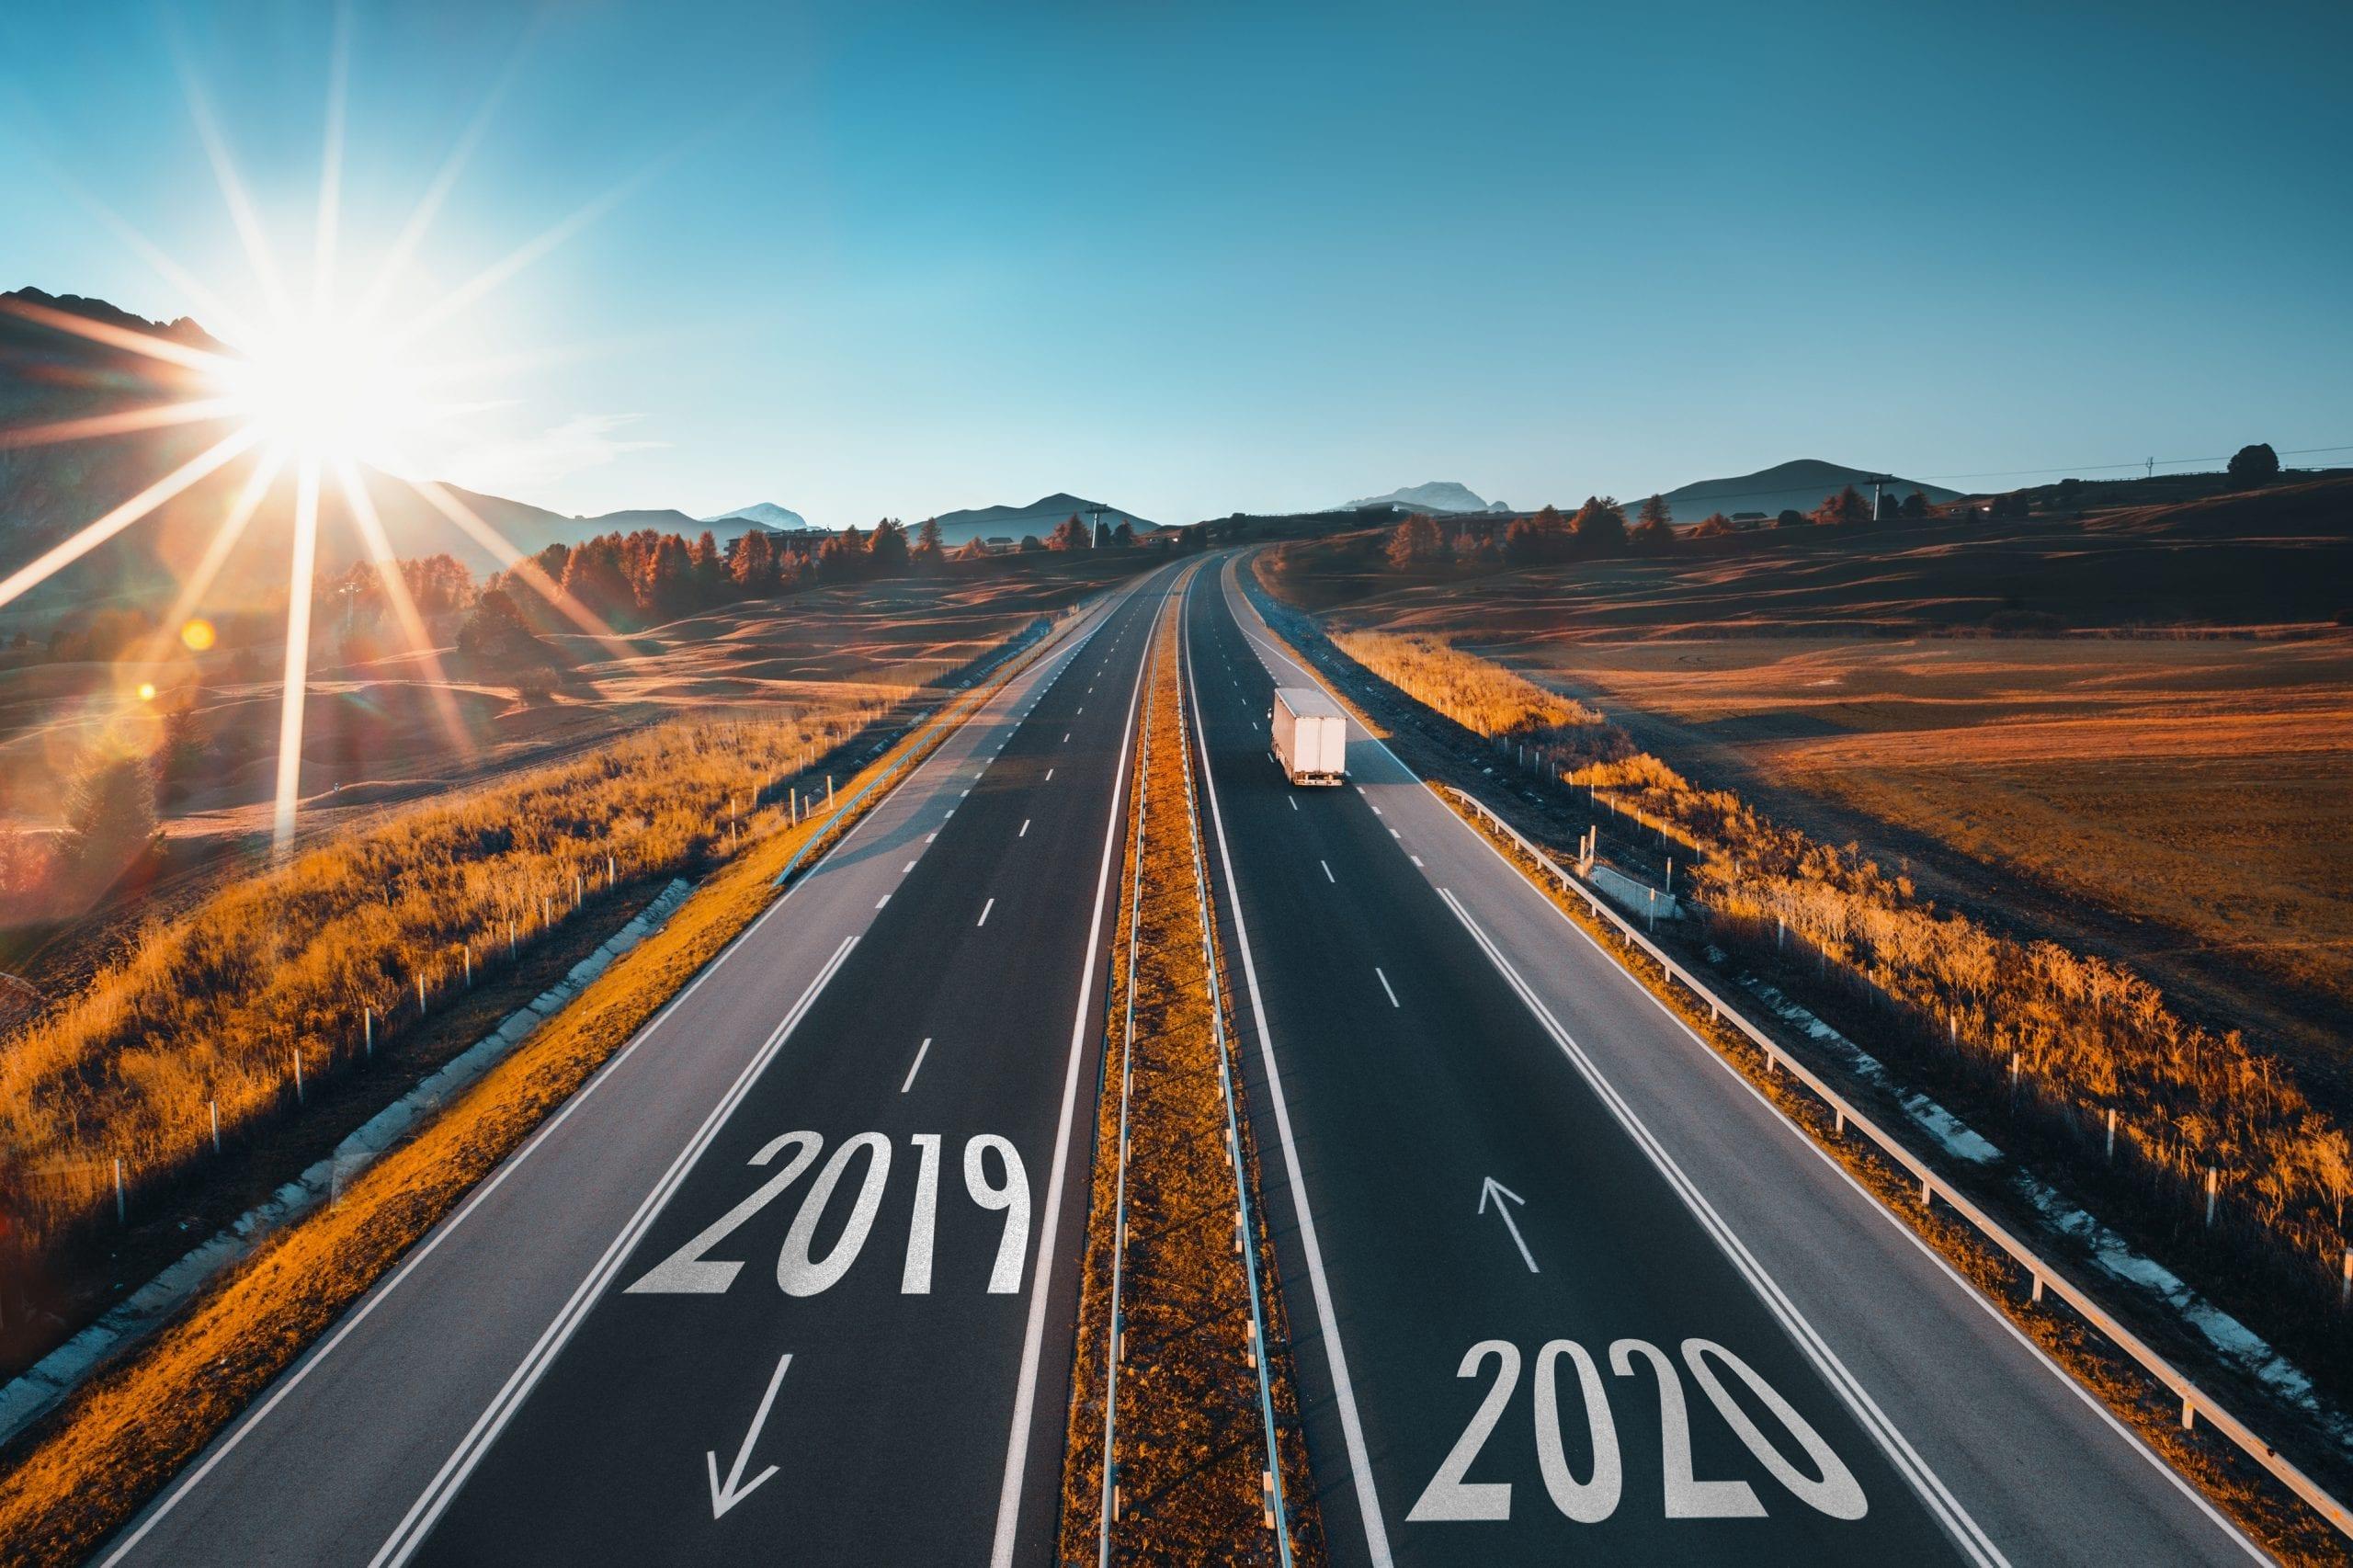 2020 LTL Shipping Trends: 3 Key Updates on the Market